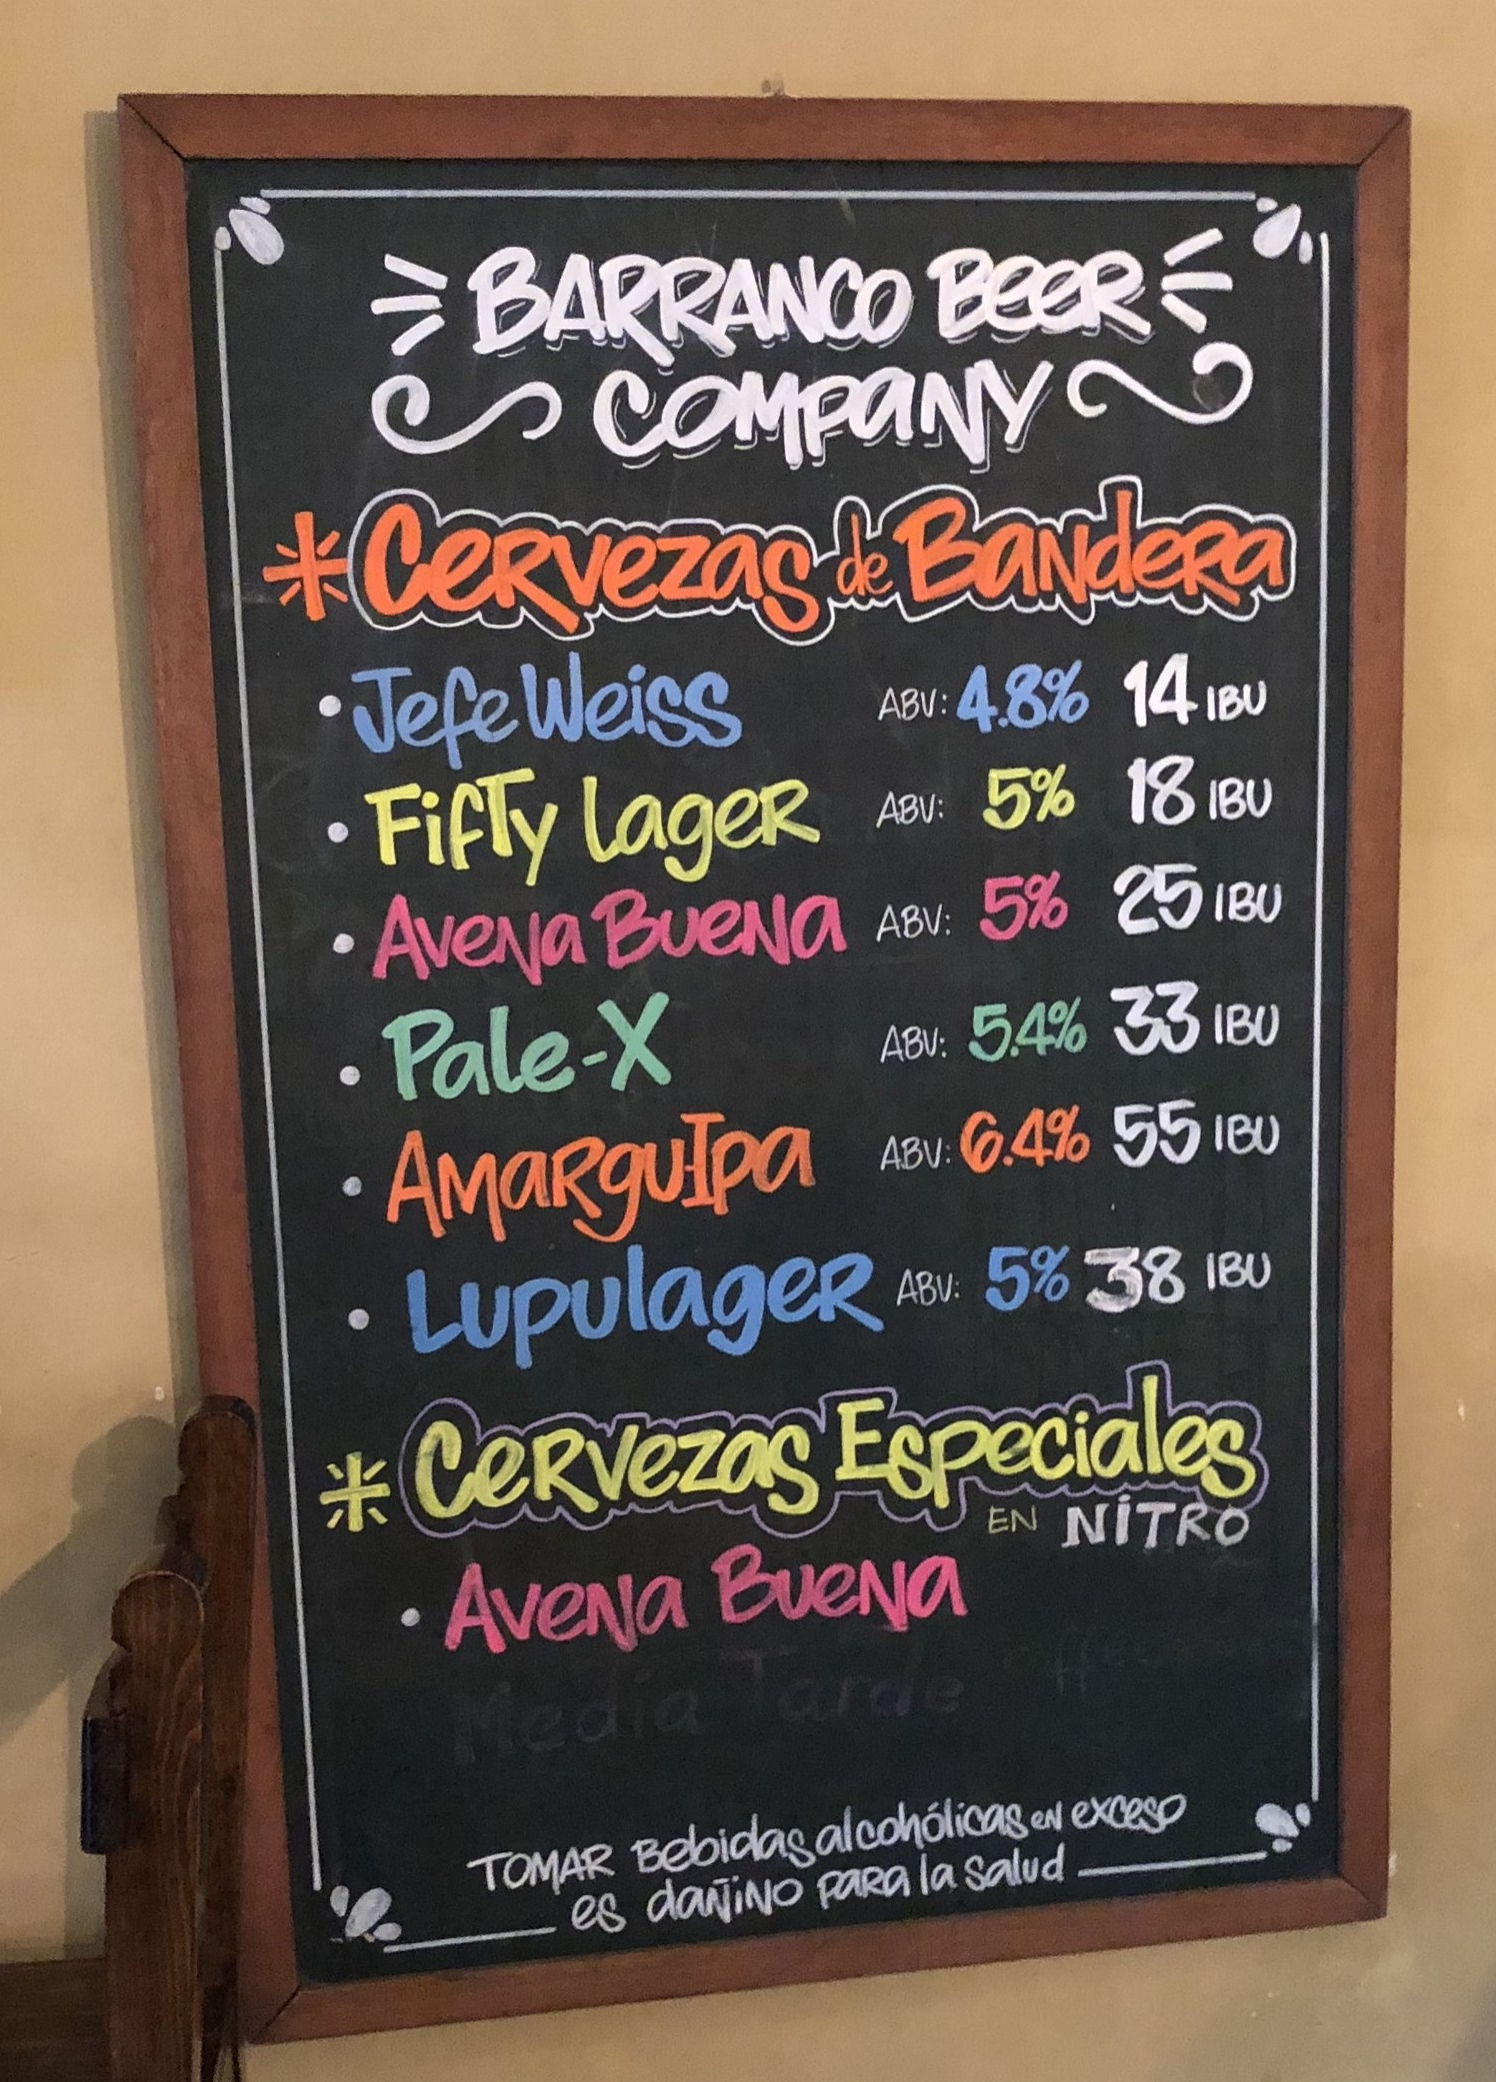 Craft Beer Menu at Barranco Beer Co.